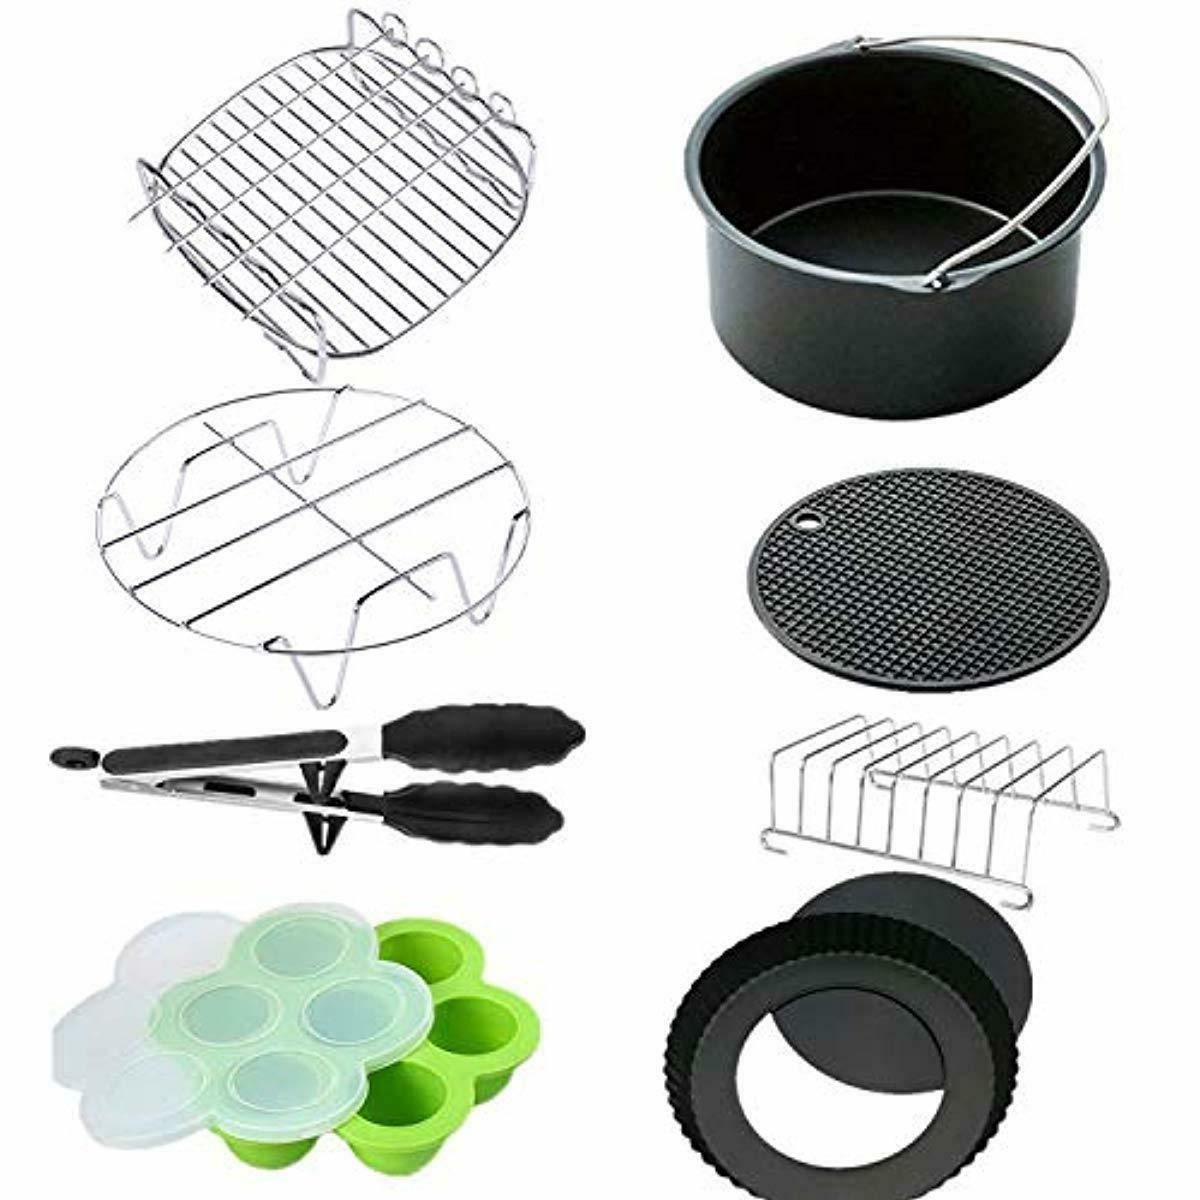 8 pcs xl 8 air fryer accessories